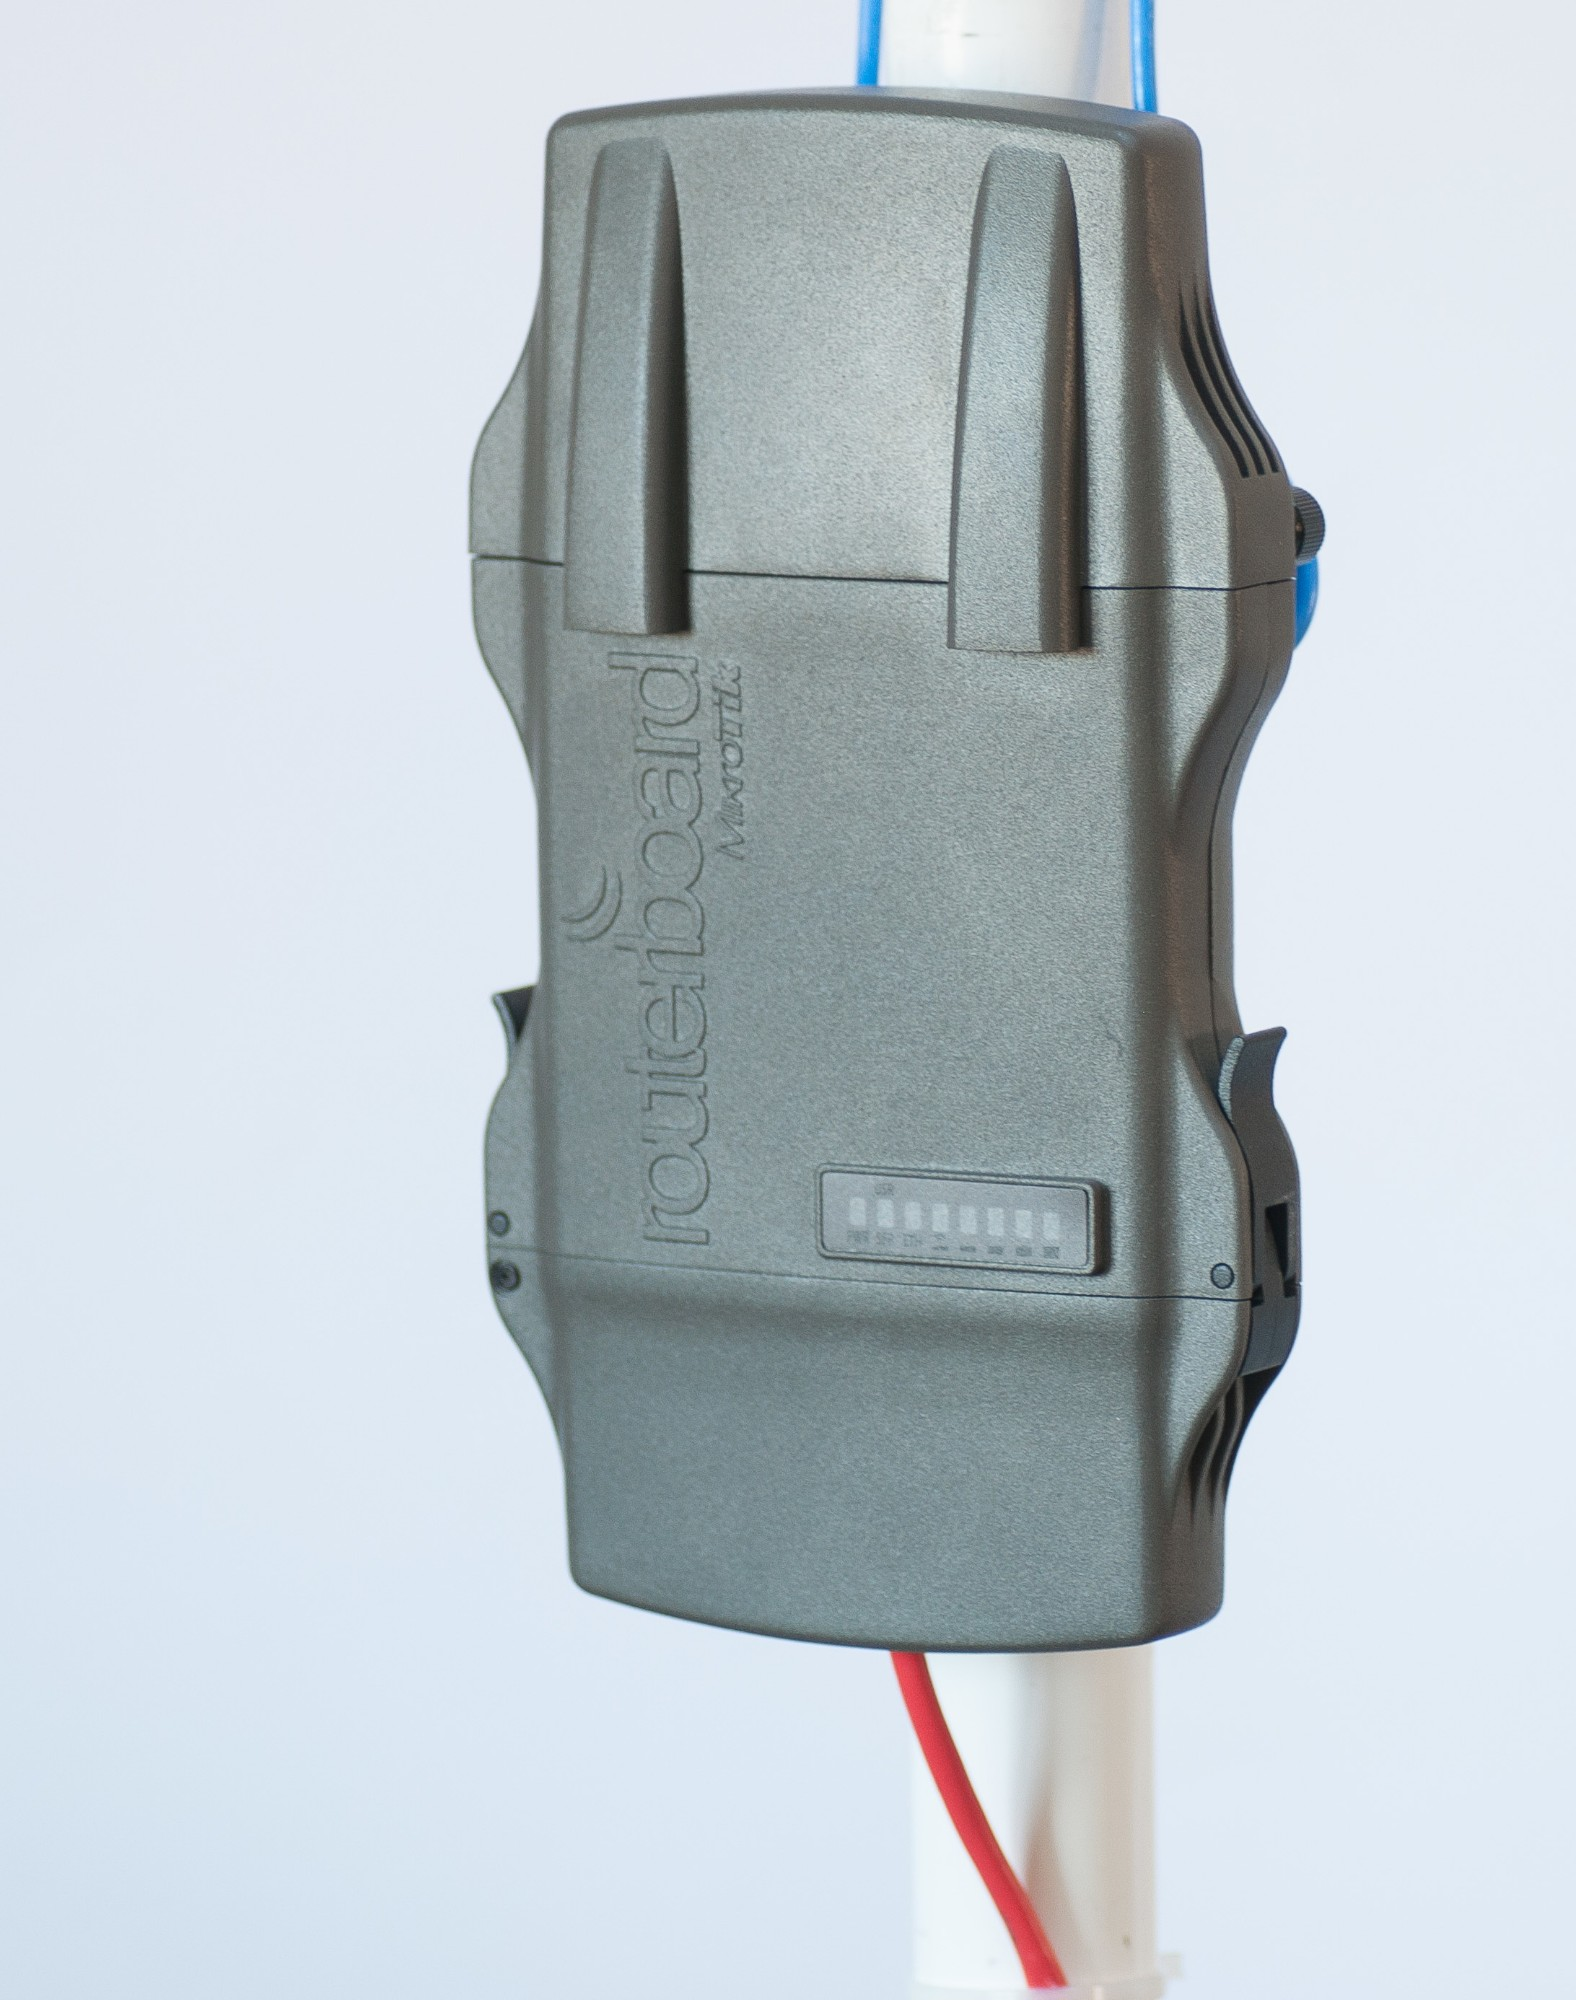 Mikrotik NetMetal 5 Power over Ethernet (PoE) WLAN access point